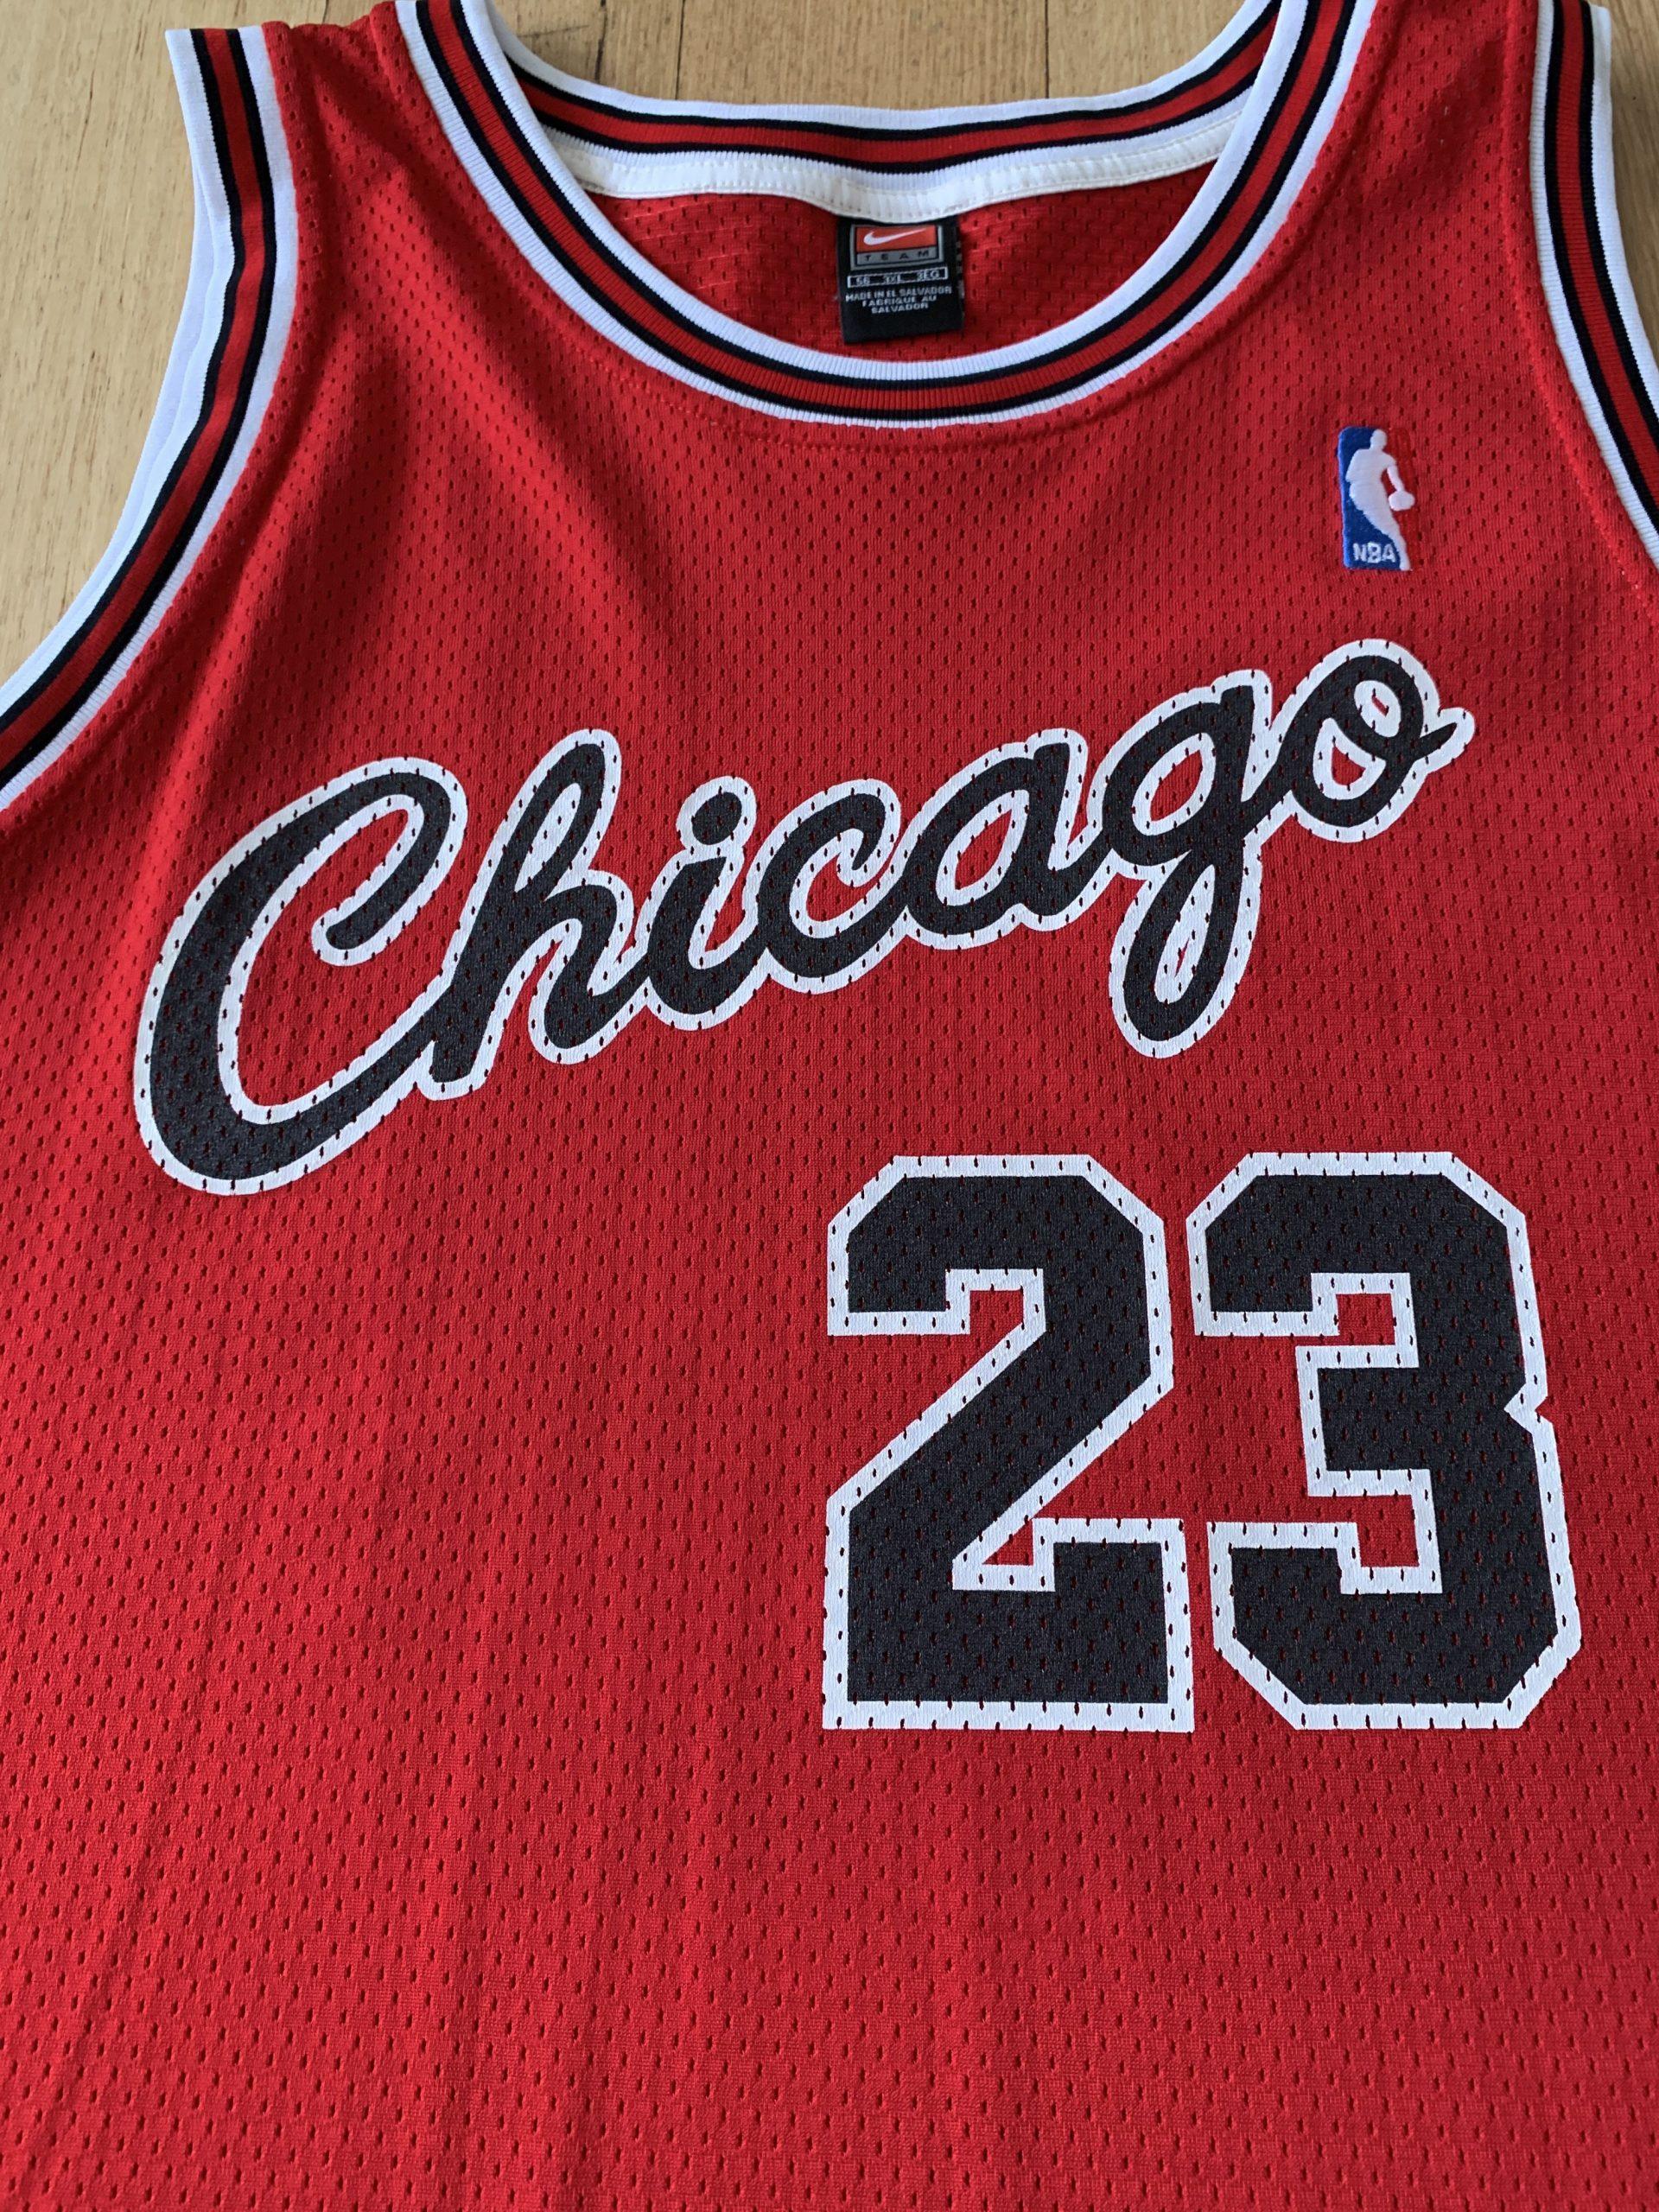 nike nba jerseys wholesale Nike Michael Jordan Chicago ...